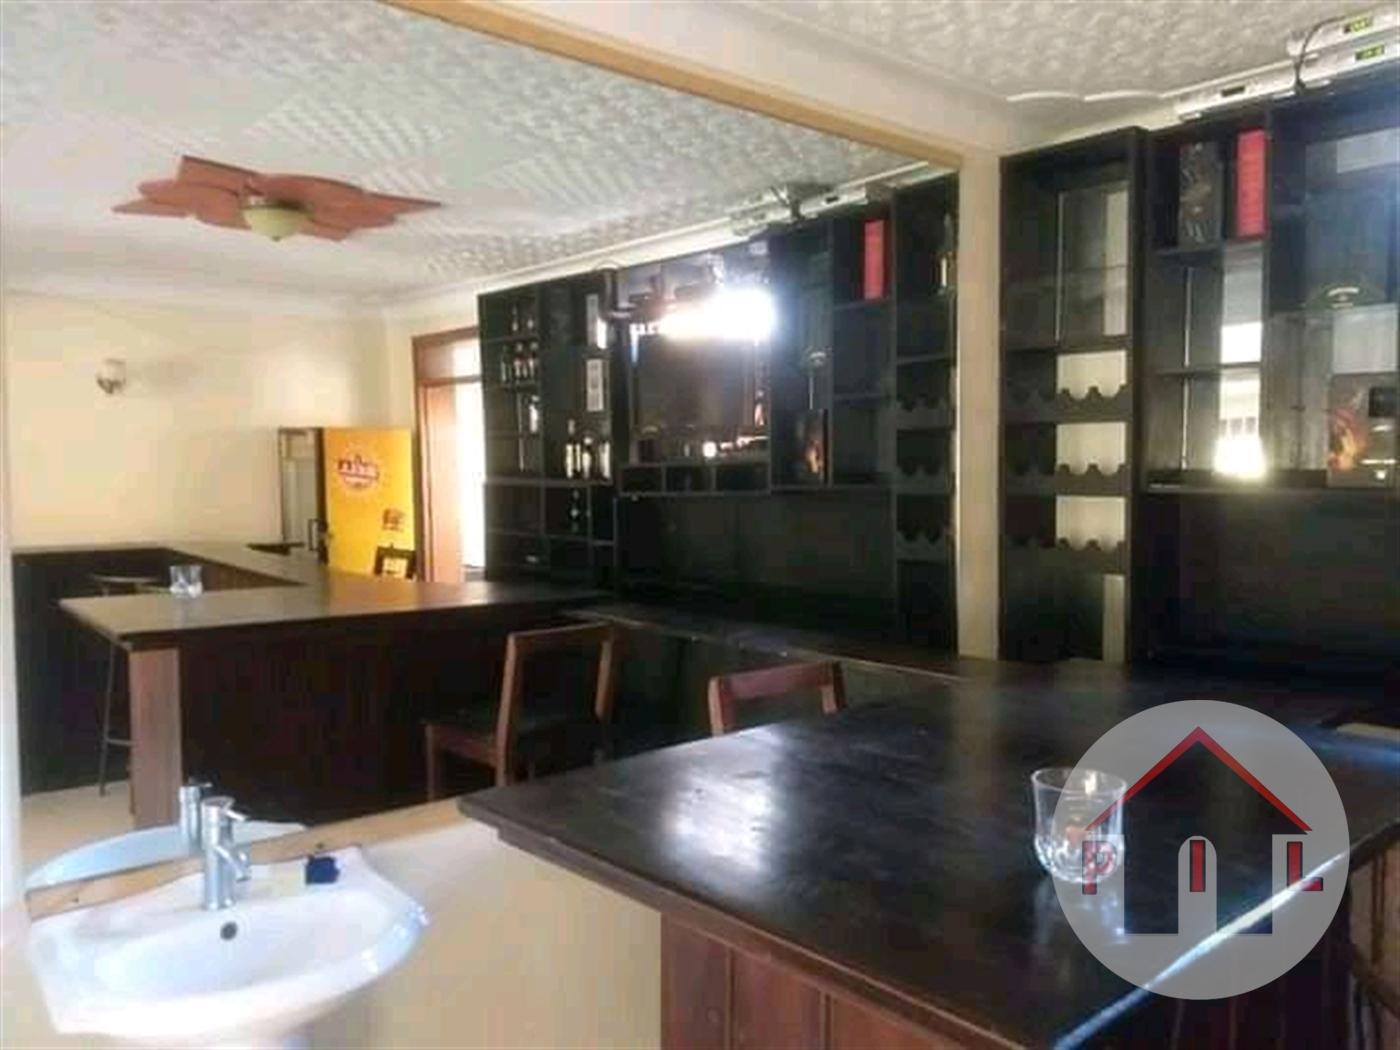 Mansion for sale in Namuwonge Wakiso